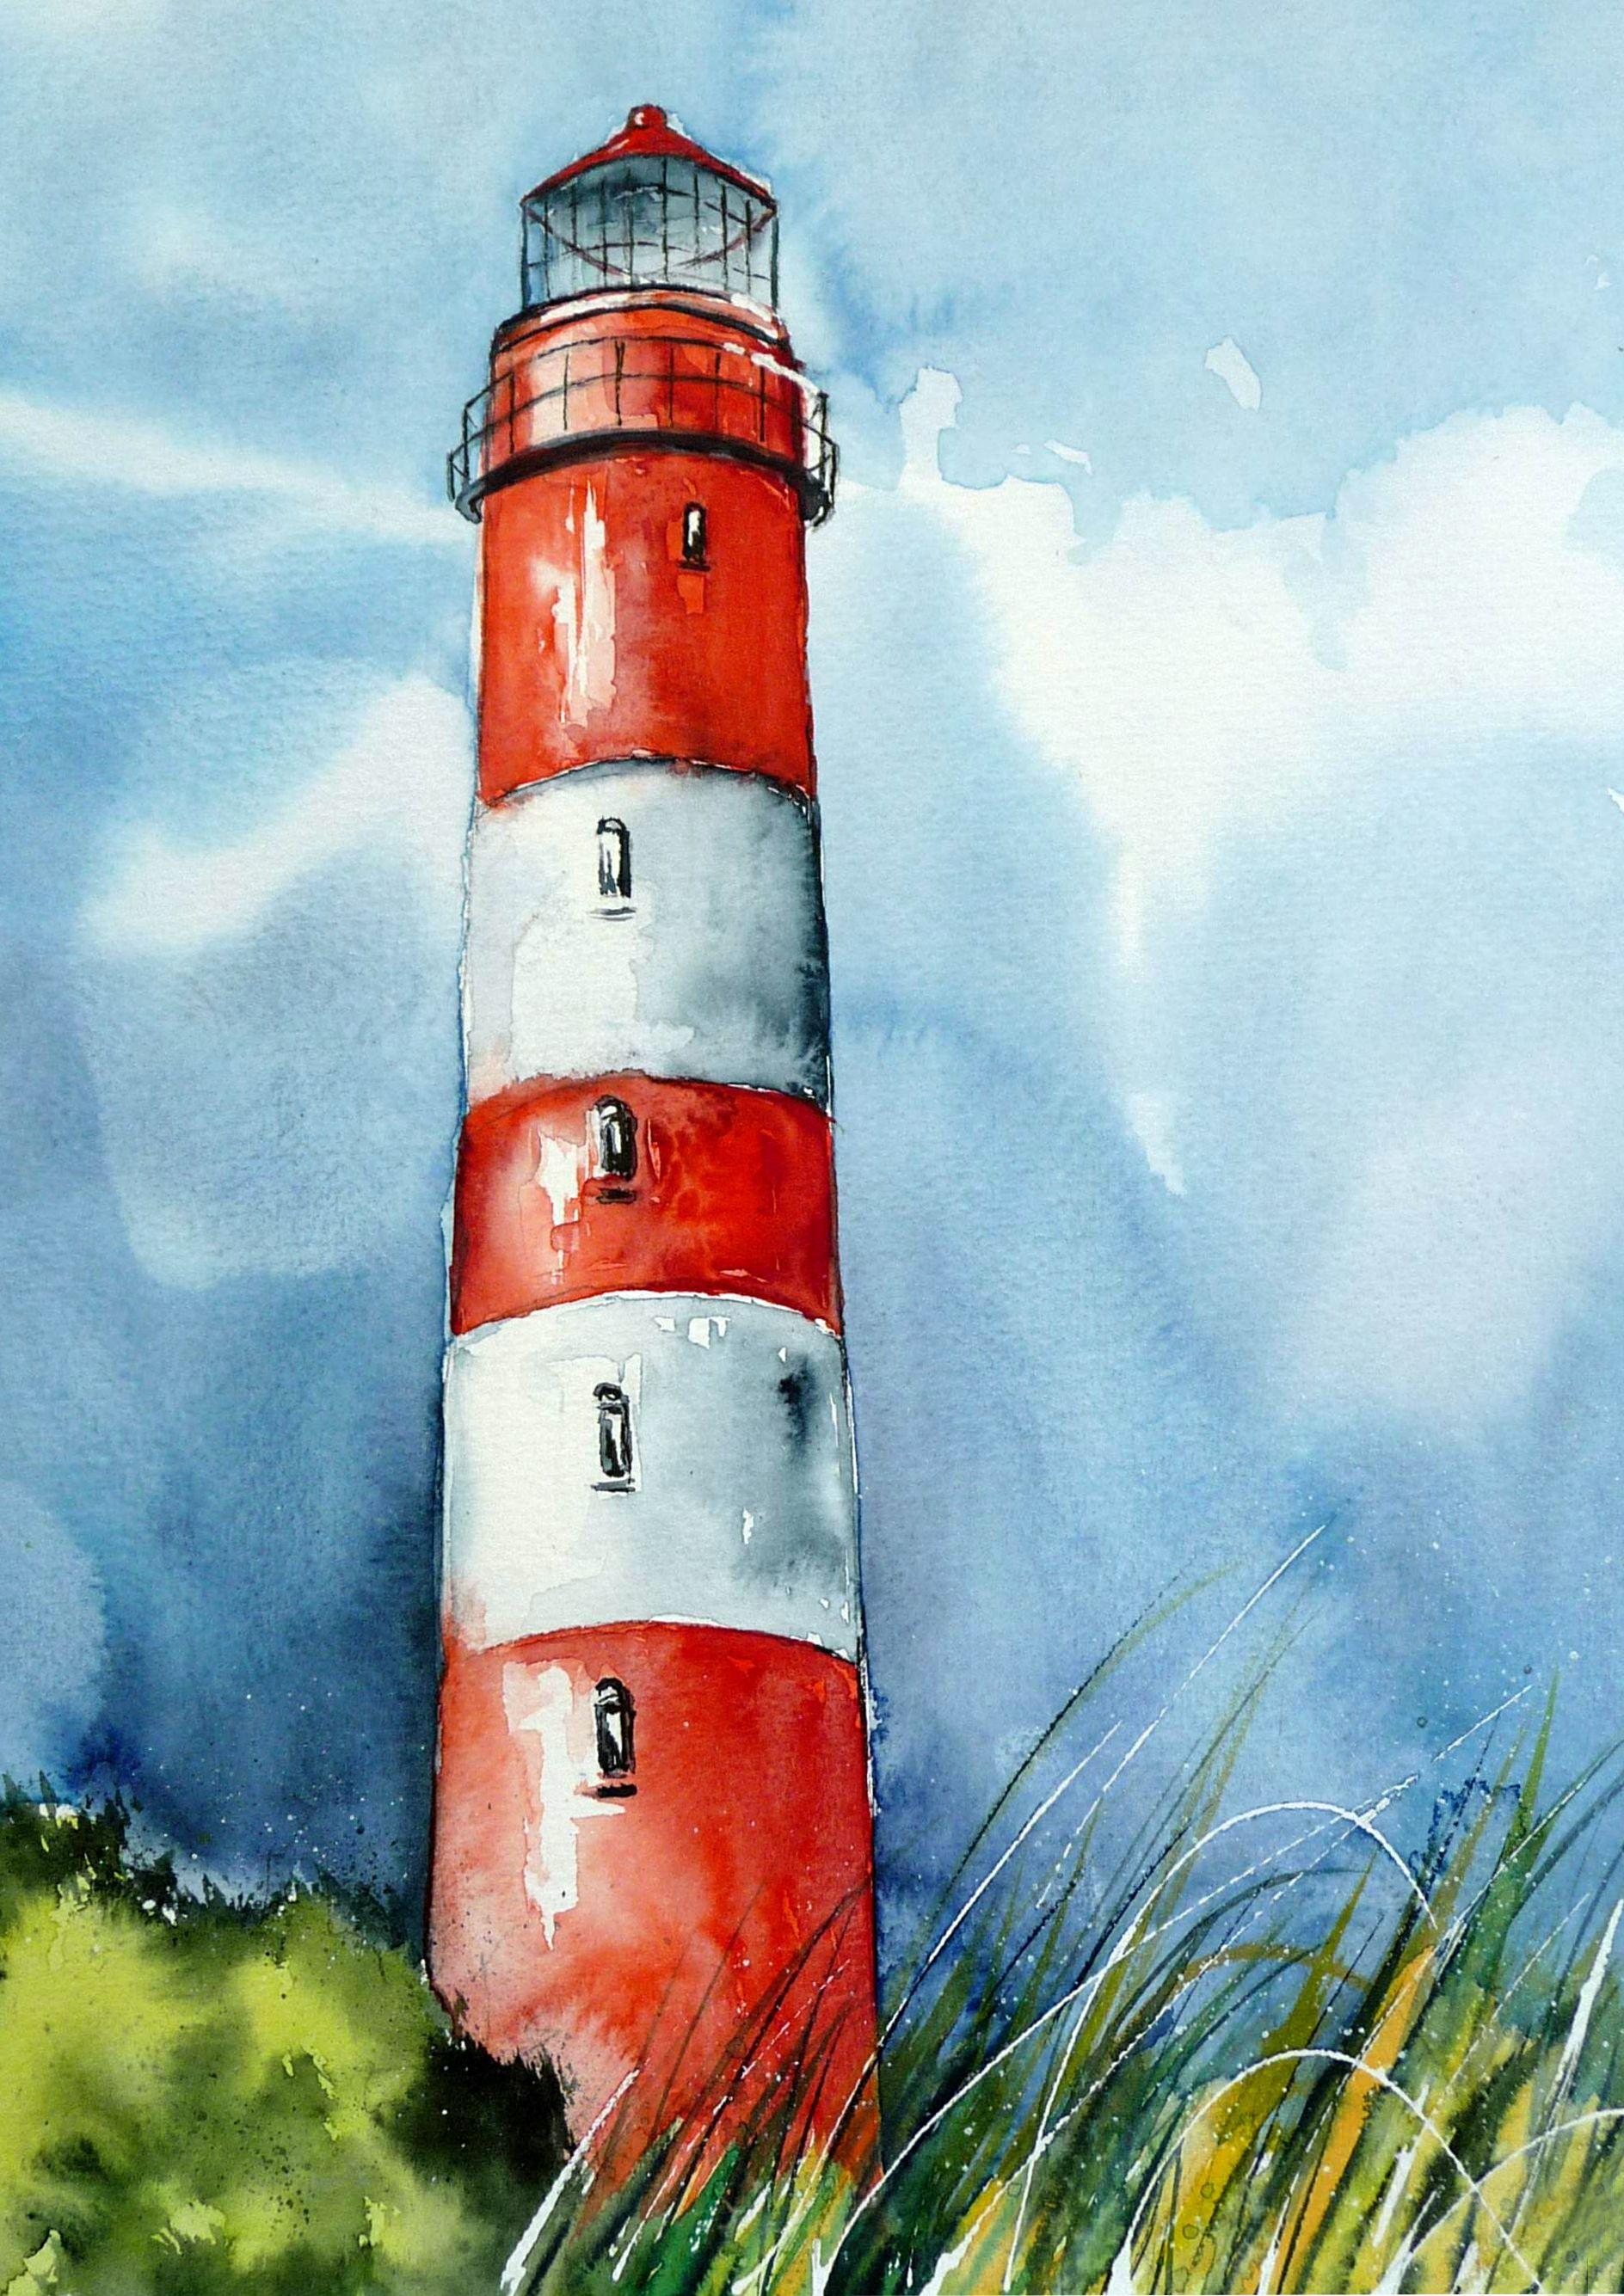 Antje Hettner Aquarell Watercolor Kunst Malerei Blumen Original